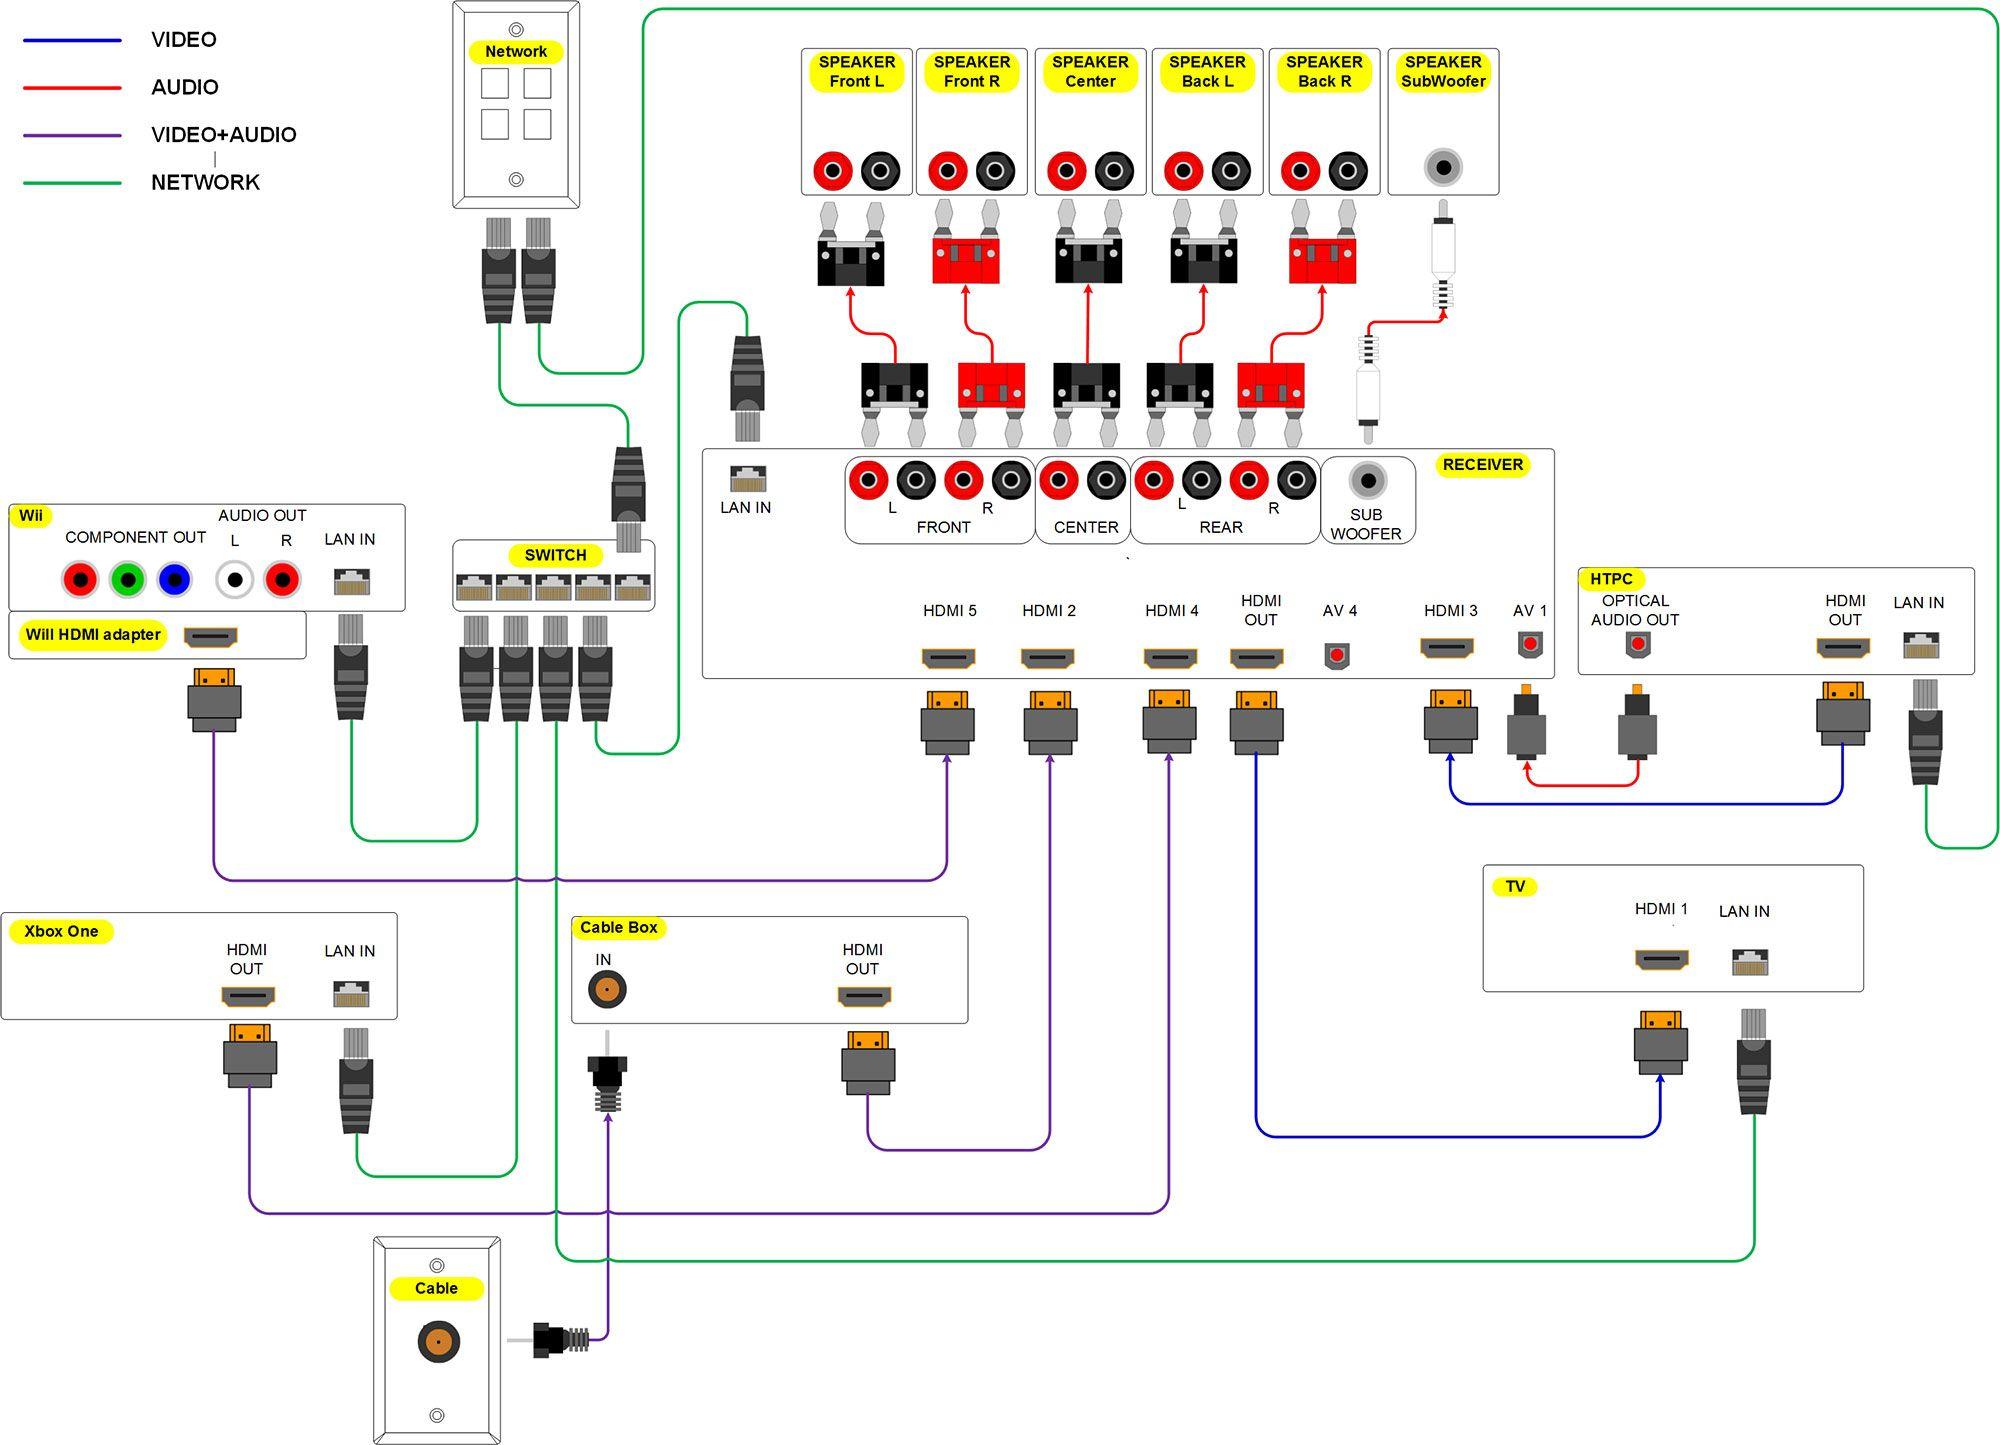 Home Audio Wiring Diagram - Today Wiring Diagram - Home Speaker Wiring Diagram